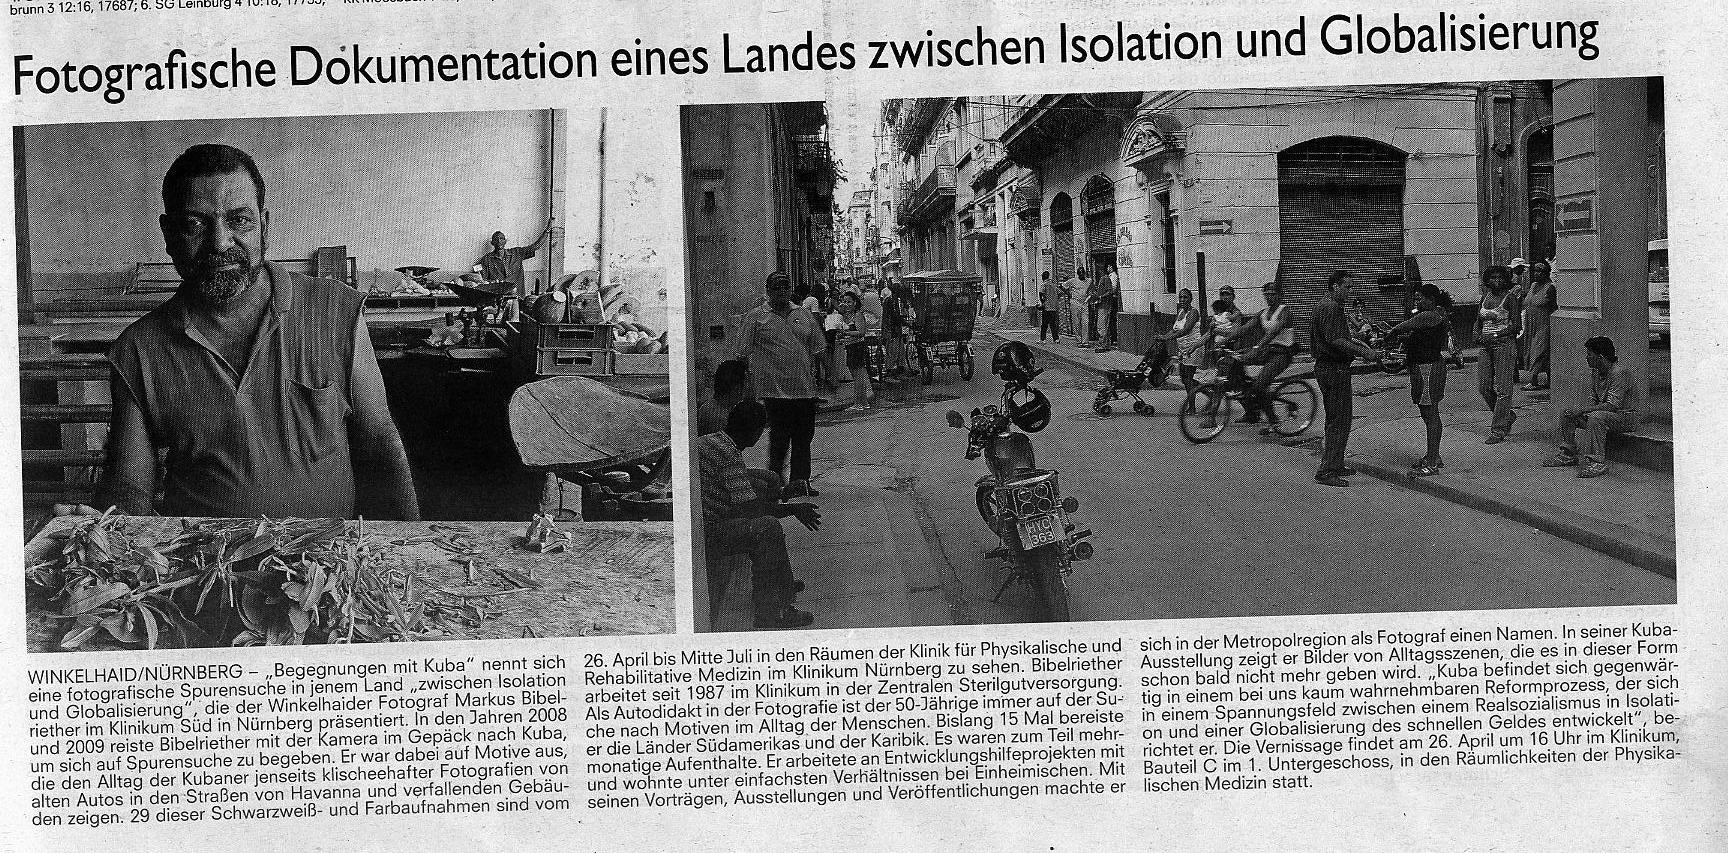 Fotoausstellung, Eröffnung am 26.04.2012, Zeitungsartikel